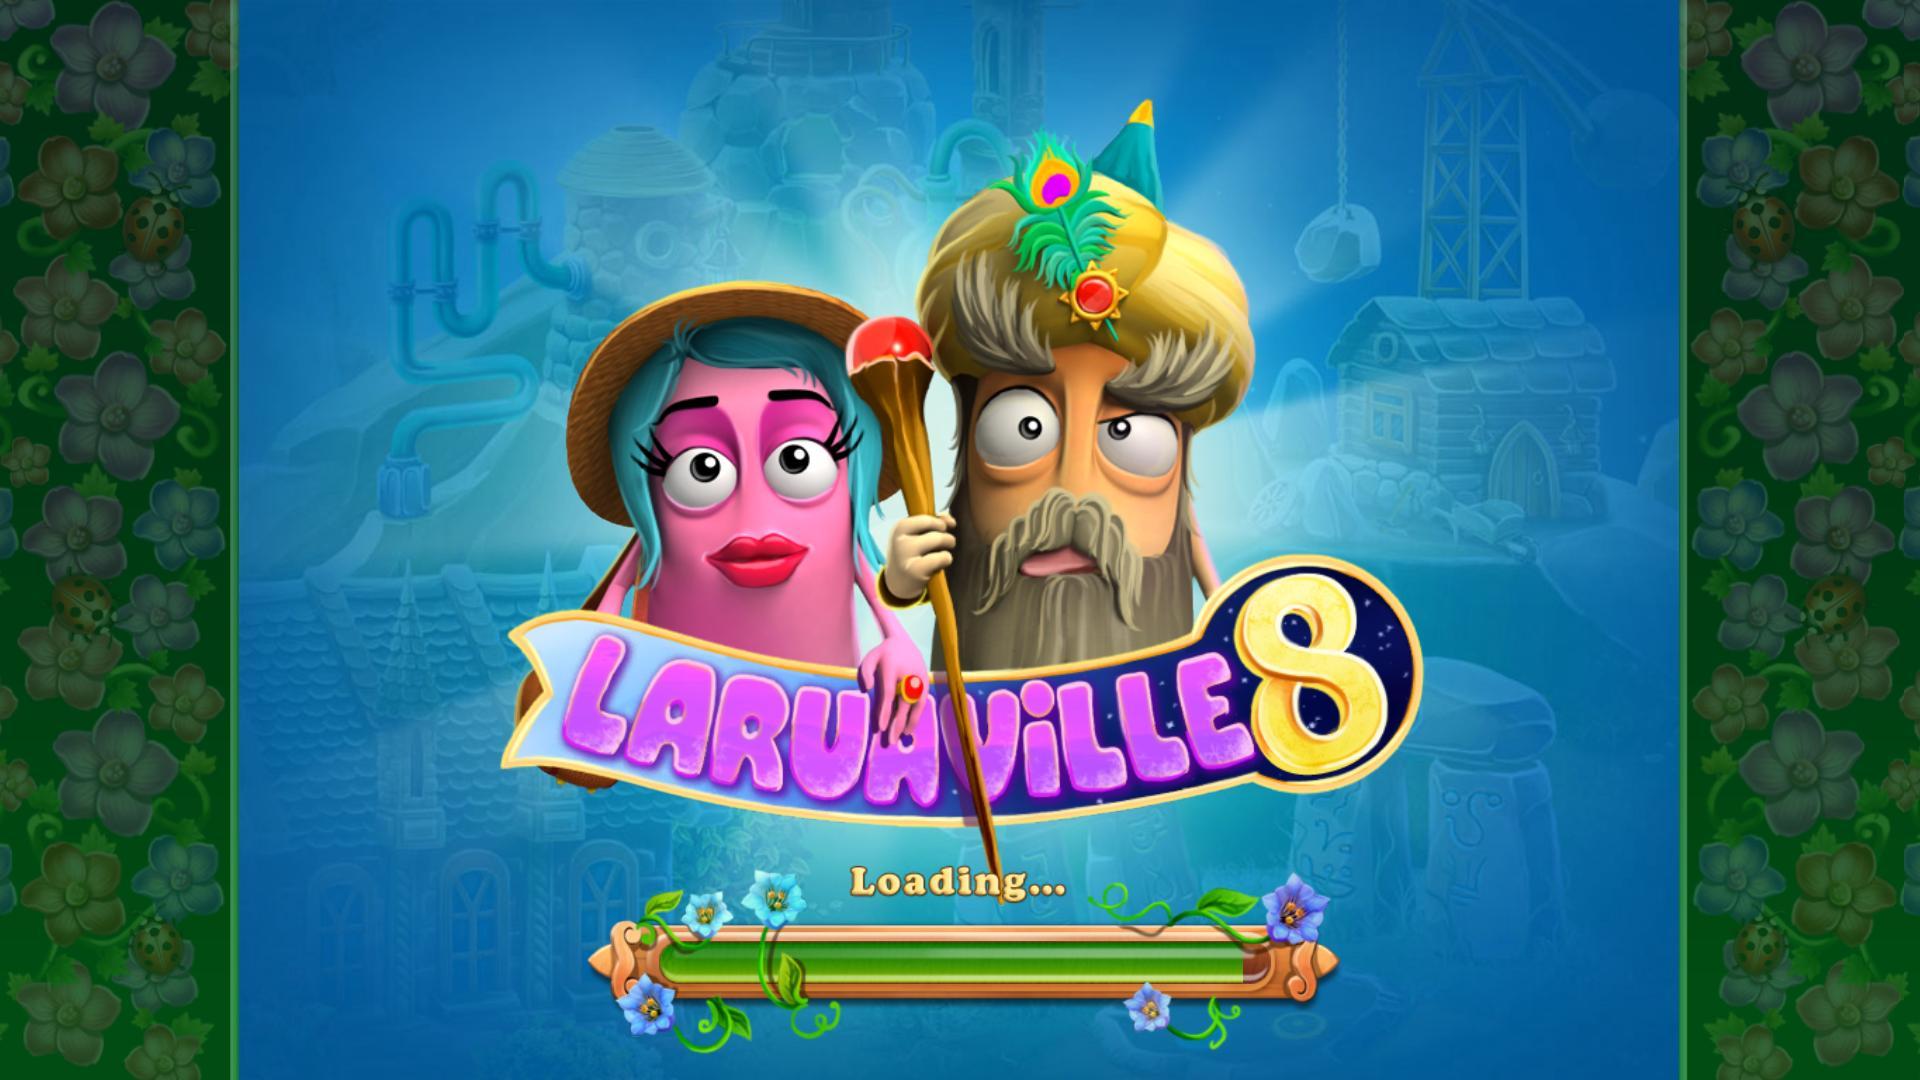 Ларуавиль 8 | Laruaville 8 (En)